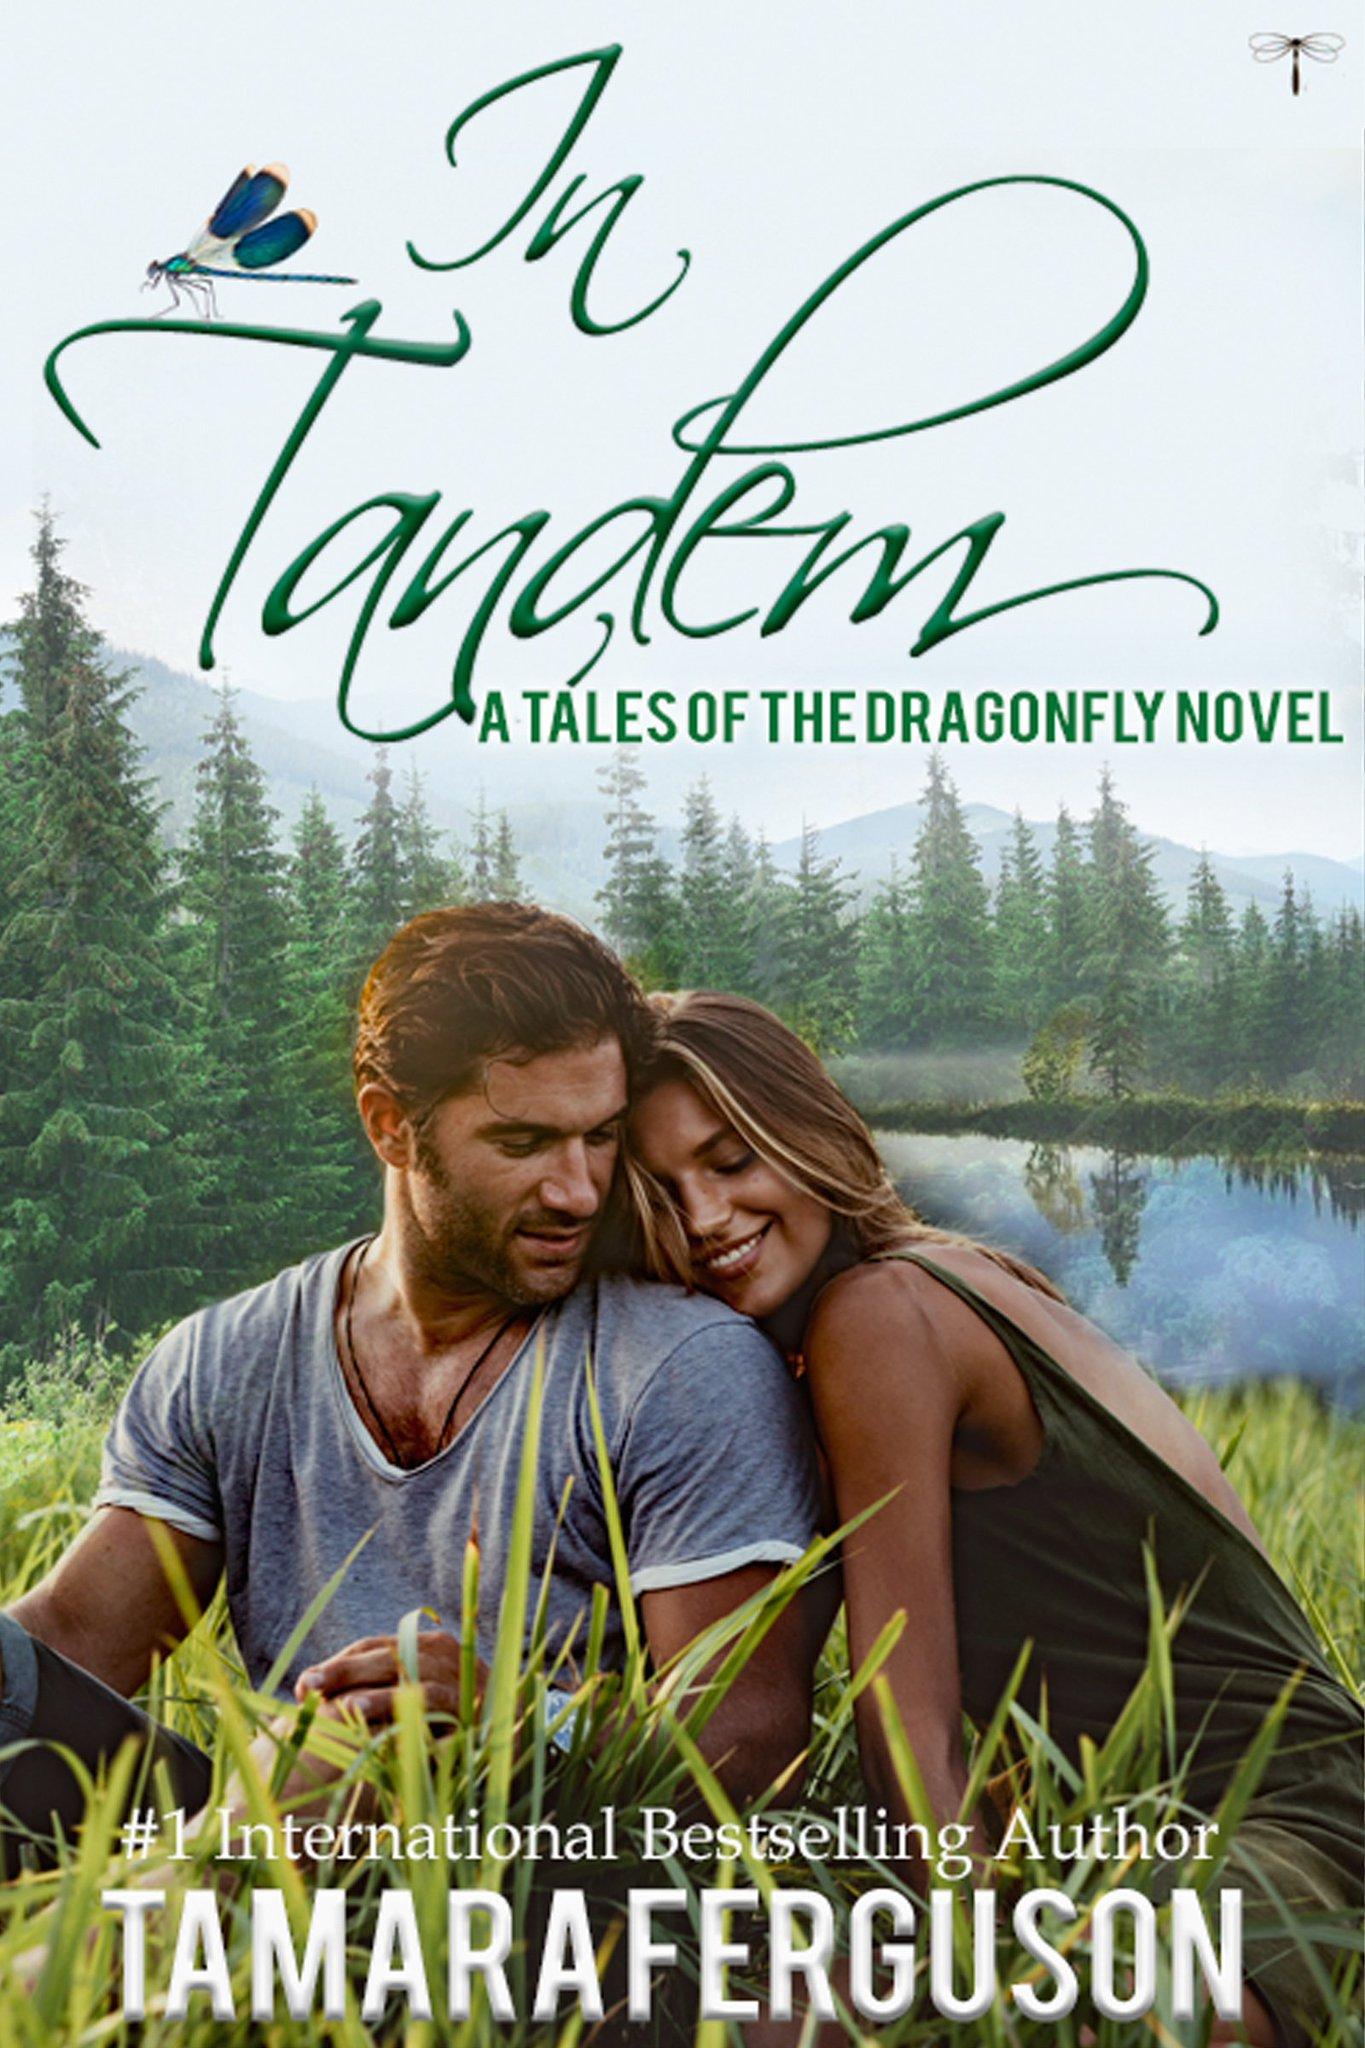 #1 BEST SELLER #SUSPENSE Dragonfly IN TANDEM National Indie Excellence #Romance Finalist https://t.co/bHAqxWaHkb https://t.co/4D0emFM2zv